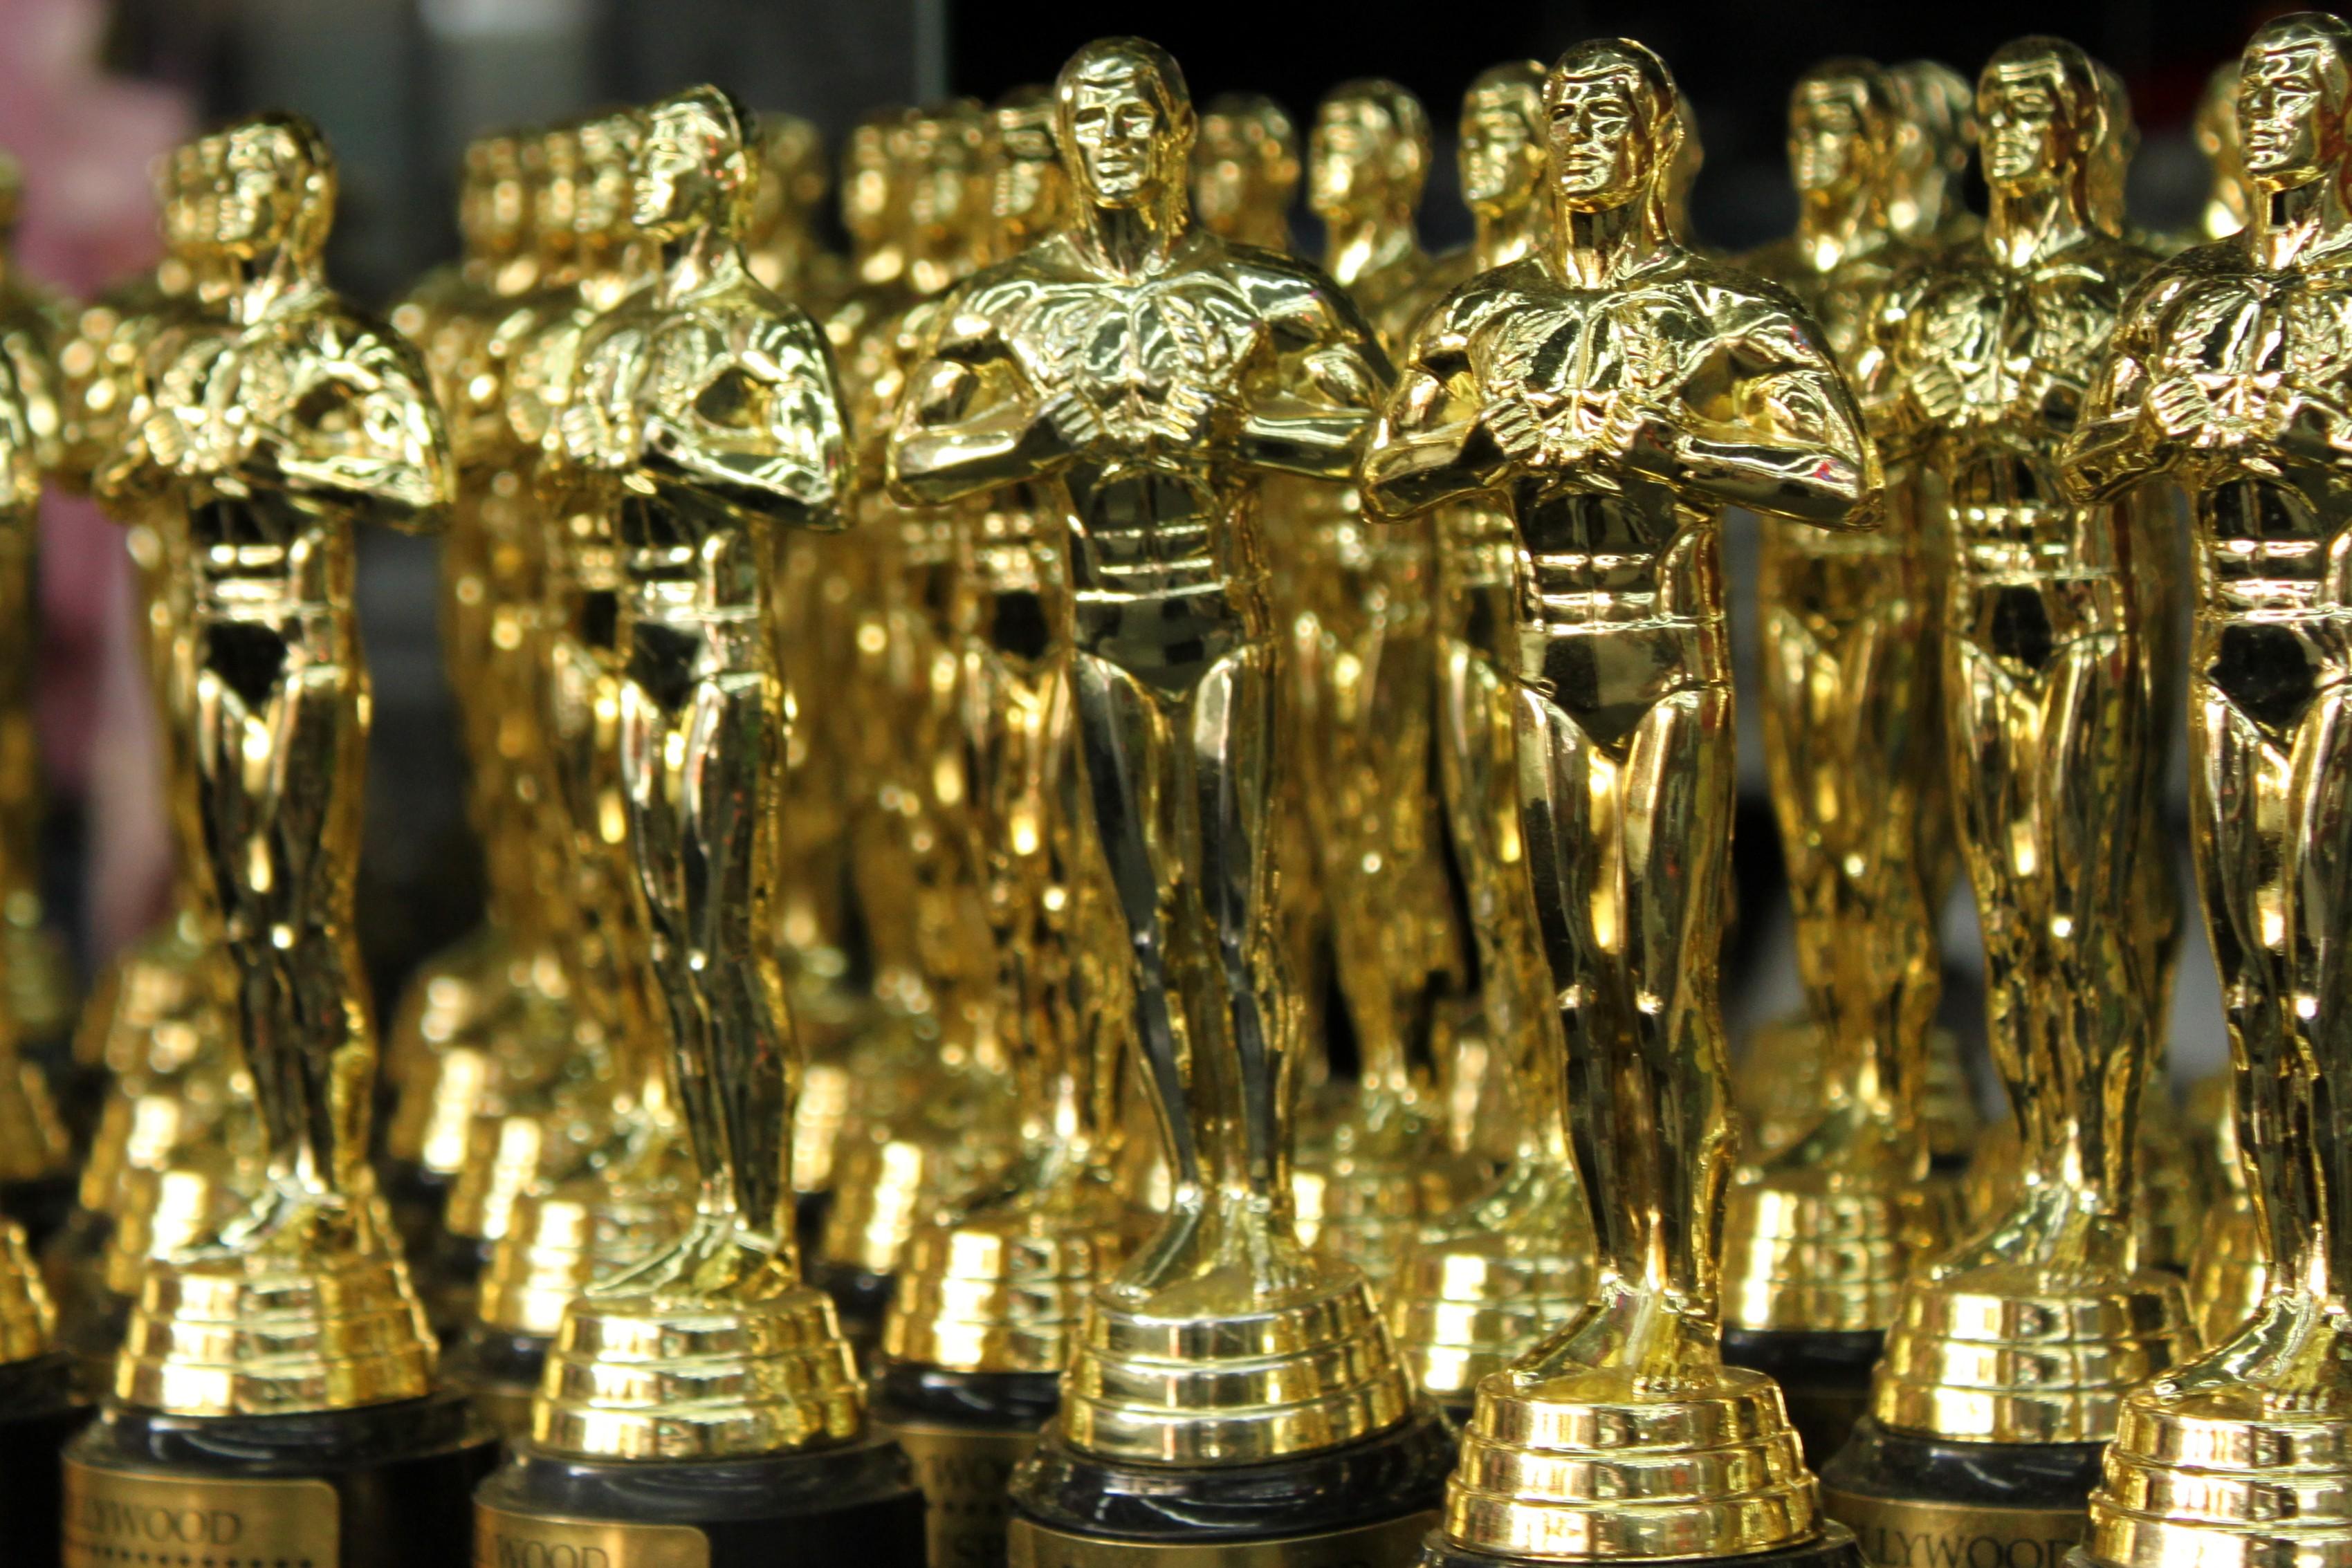 The Awards Wrap: Amasa Awards Open With New Award Announced, Audio Militia Celebrates Cannes Win photo